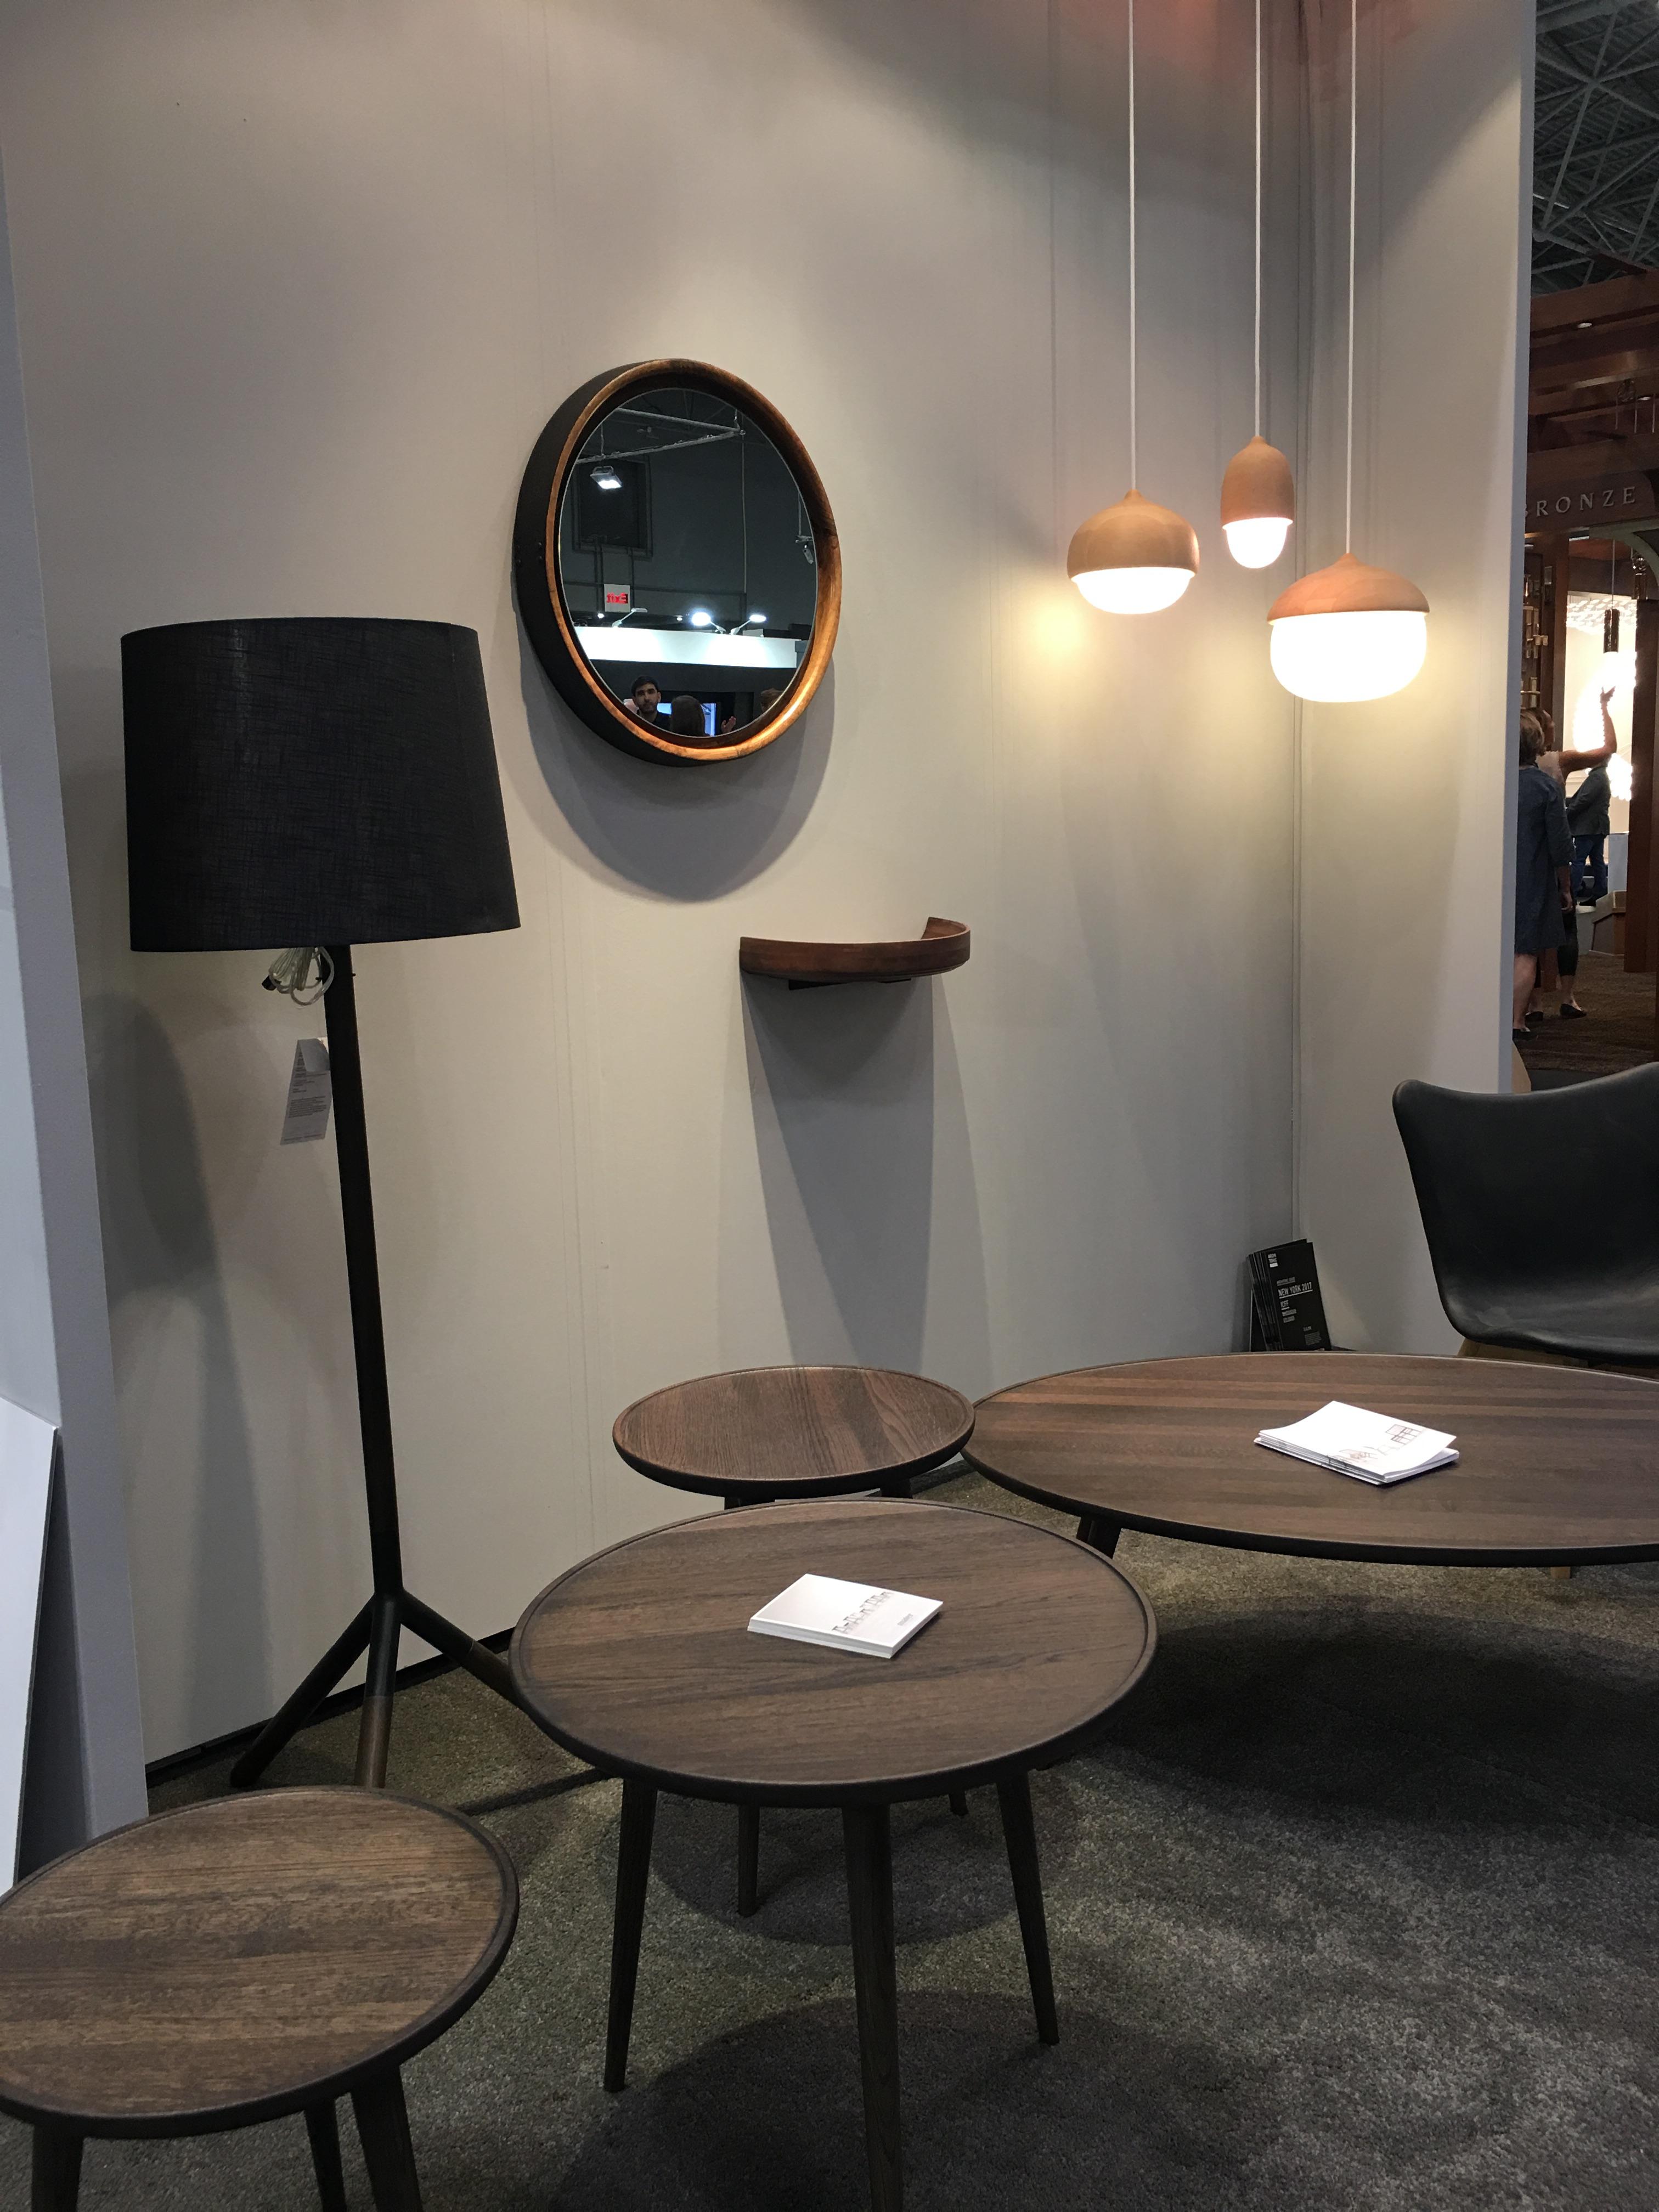 architecture lovable lamp design lighting on lamps light desk designer for verilux firanzshome ideas decorating modern